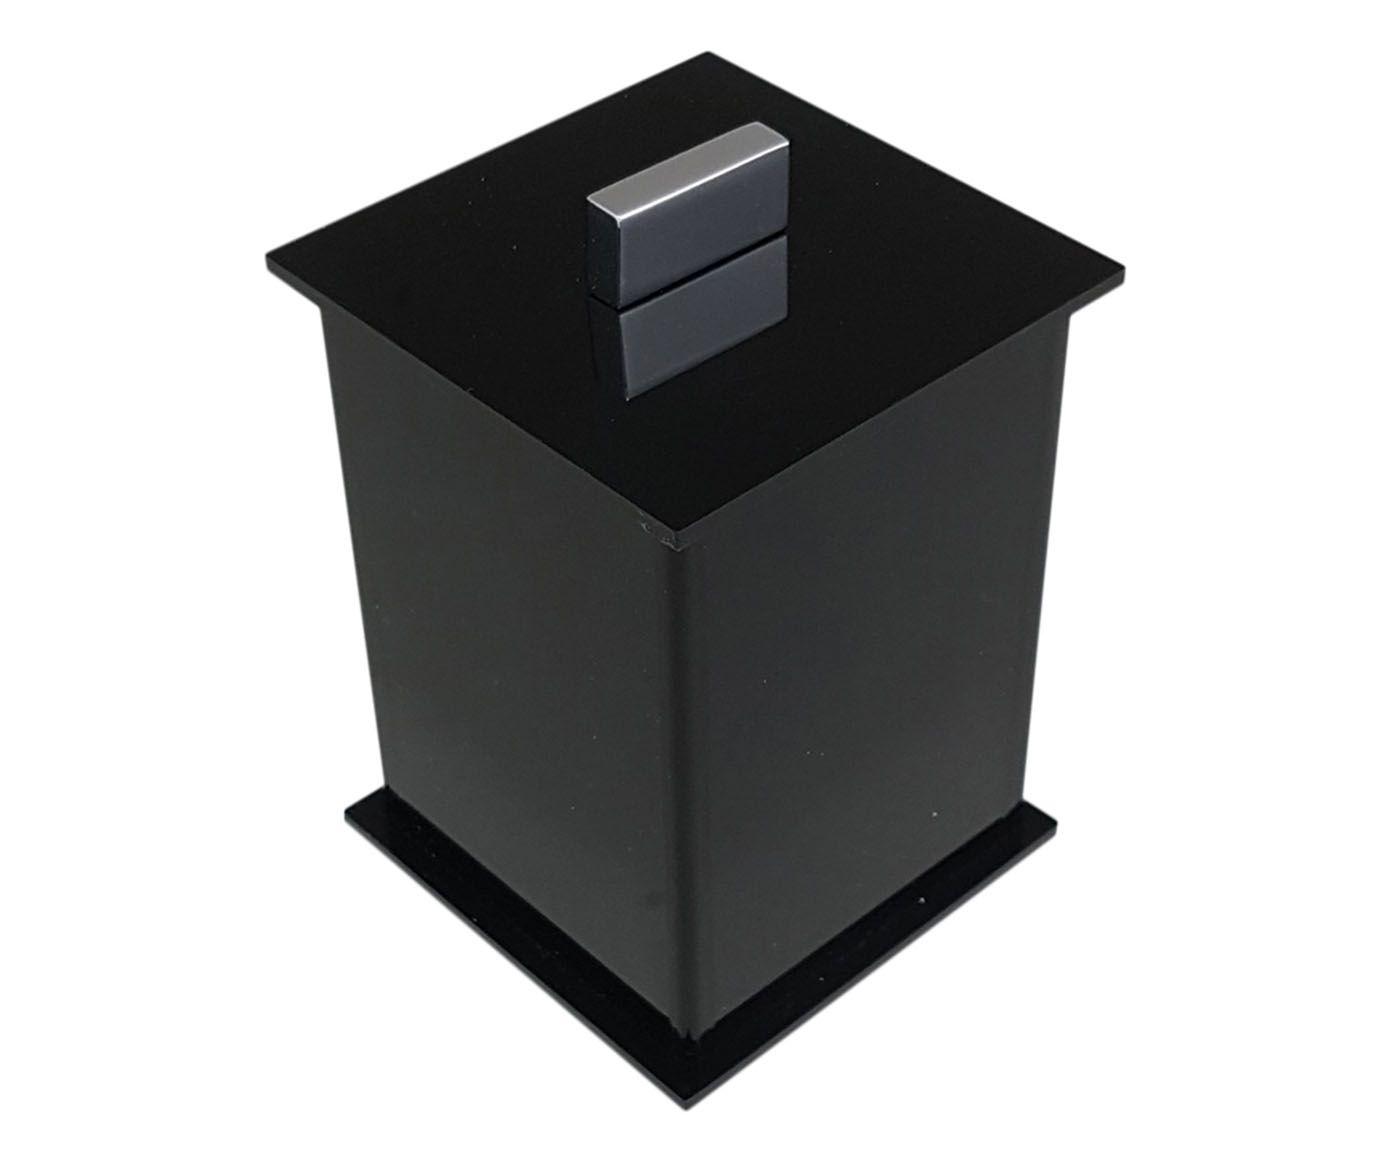 Pote Multiuso Elegance Preto - 7X10X7cm | Westwing.com.br